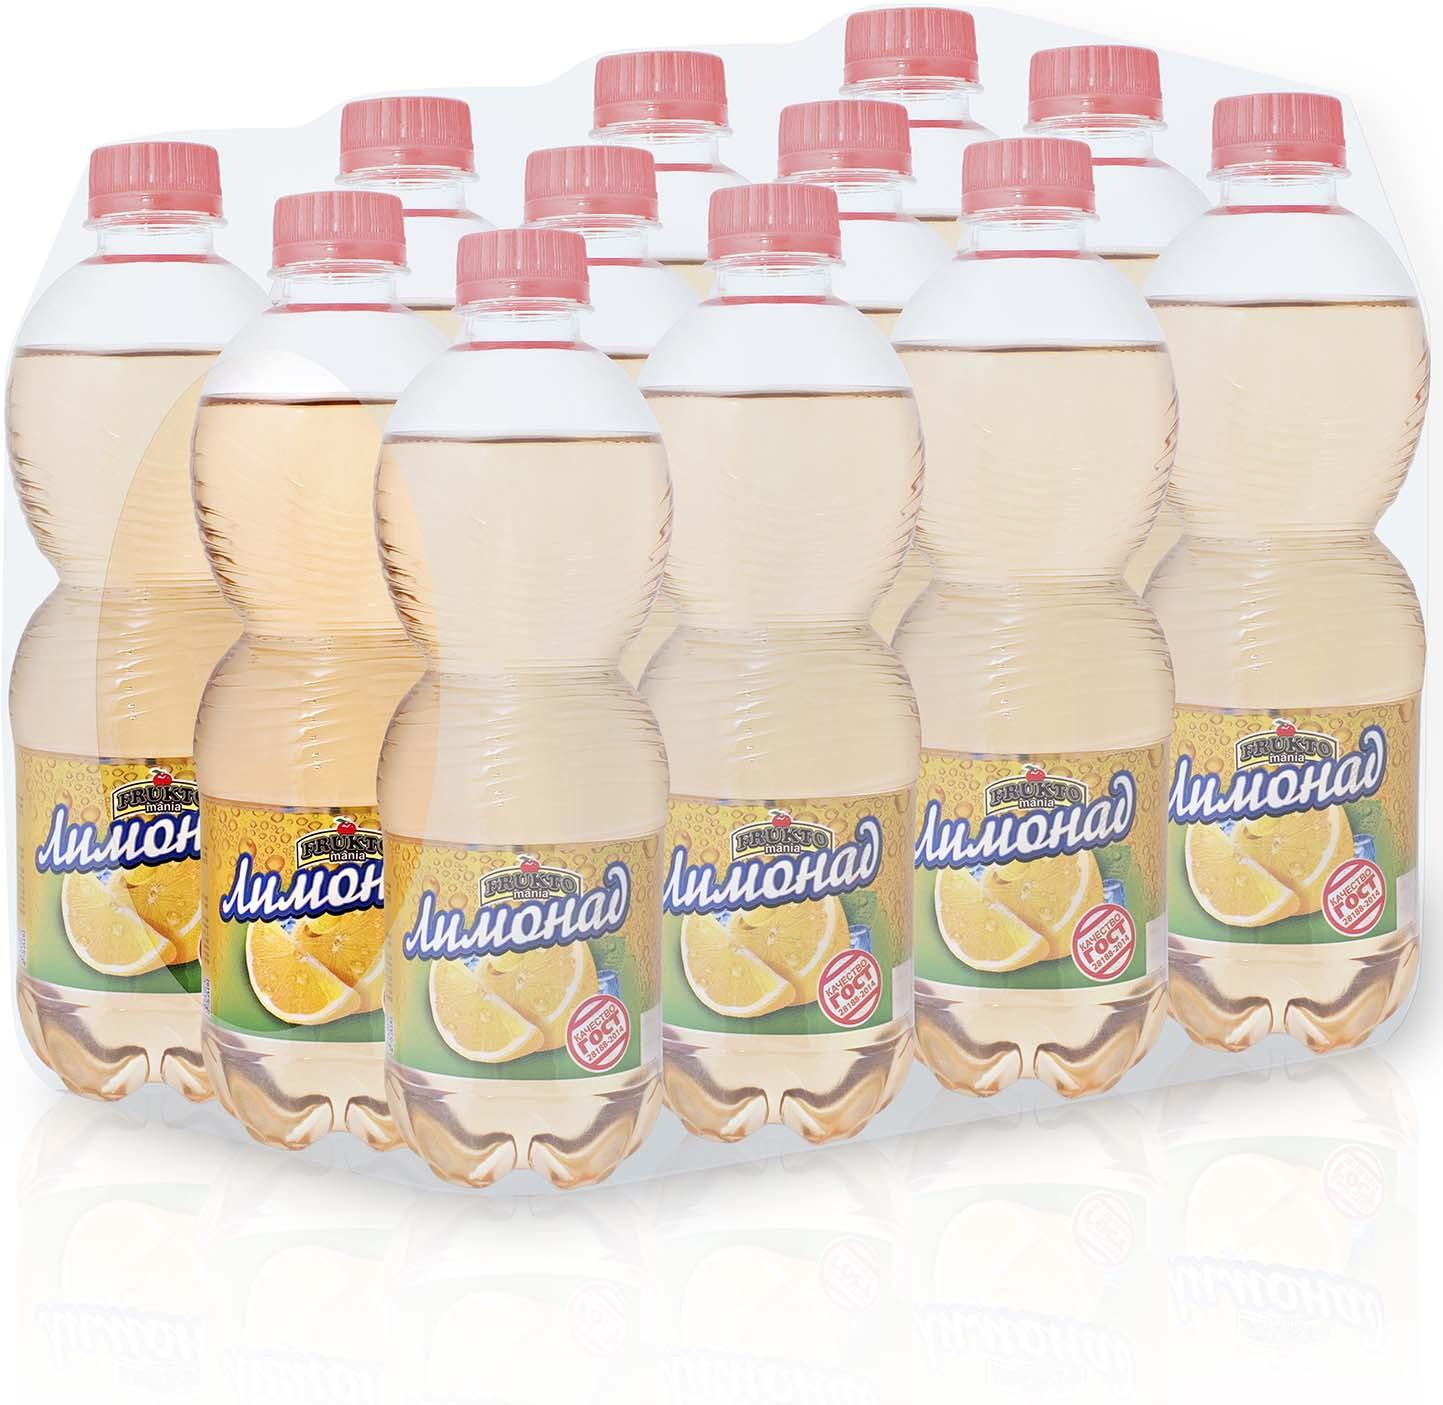 Лимонад Fruktomania, лимонад, 12 шт по 0,5 л лимонад fruktomania лимонад оригинальный 6 шт по 1 5 л